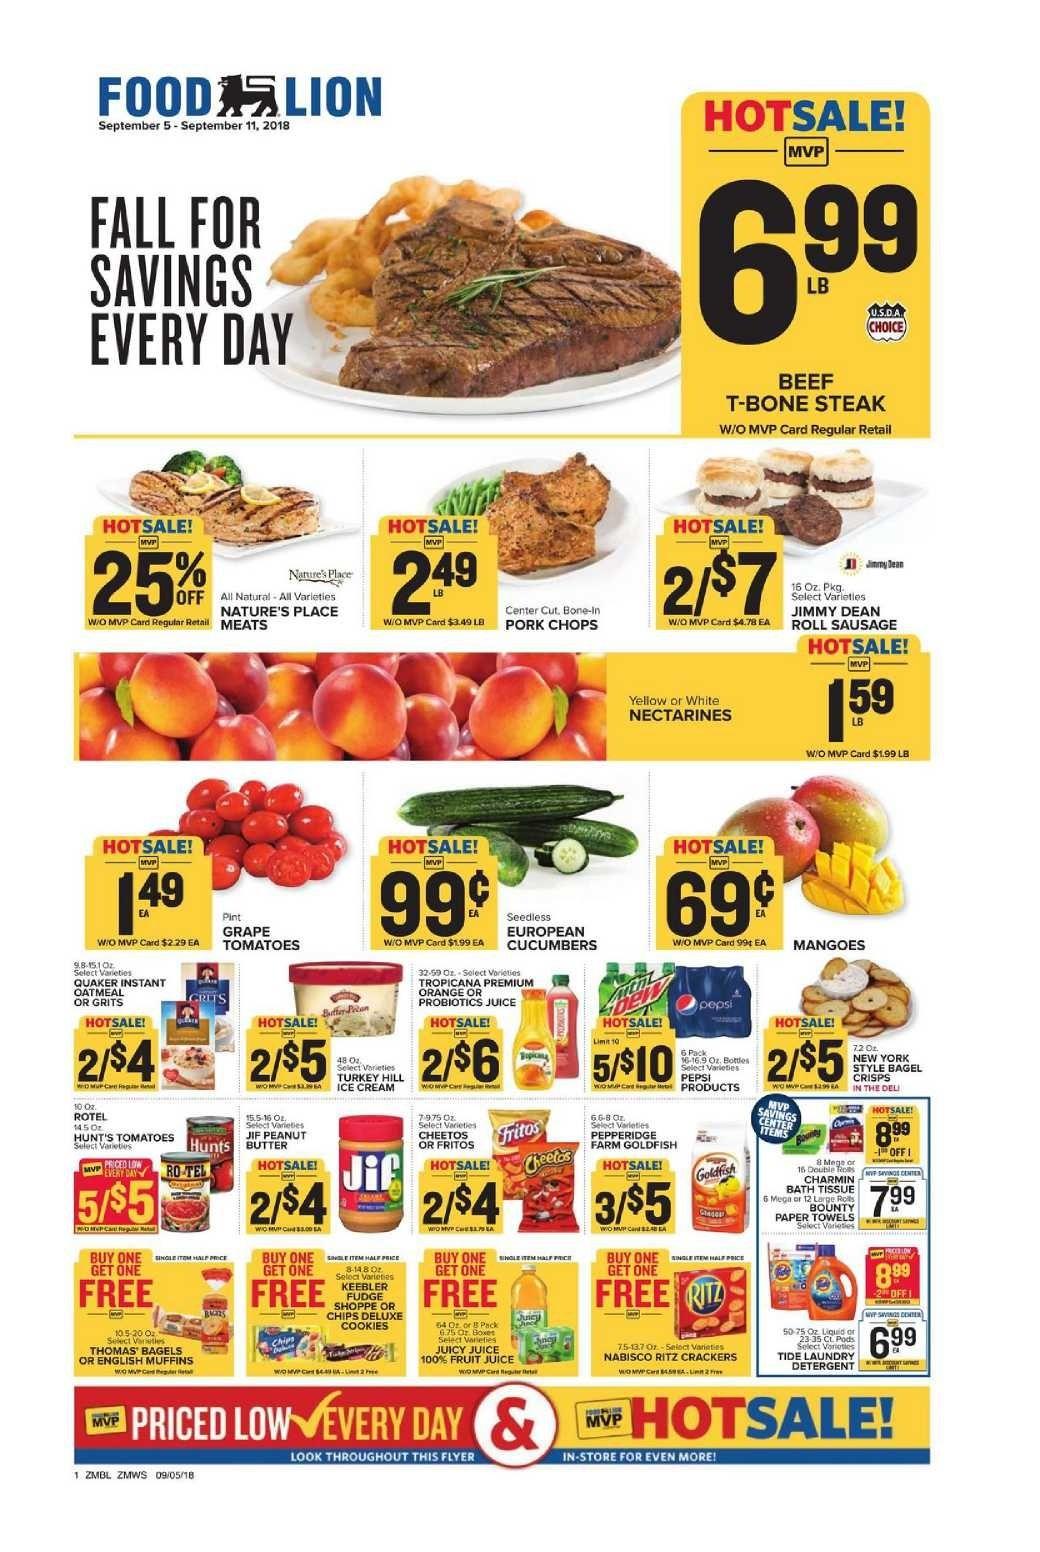 Food Sale: Food Lion Weekly Ad Flyer January 16 - 22, 2019